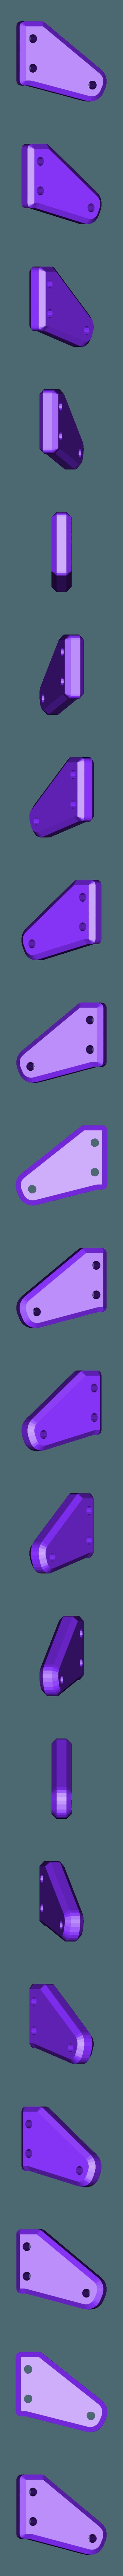 Front knukle link.STL Download free STL file 1/10 RC 4WD TRUGGY BT250.2 • 3D printer object, ivnssnn